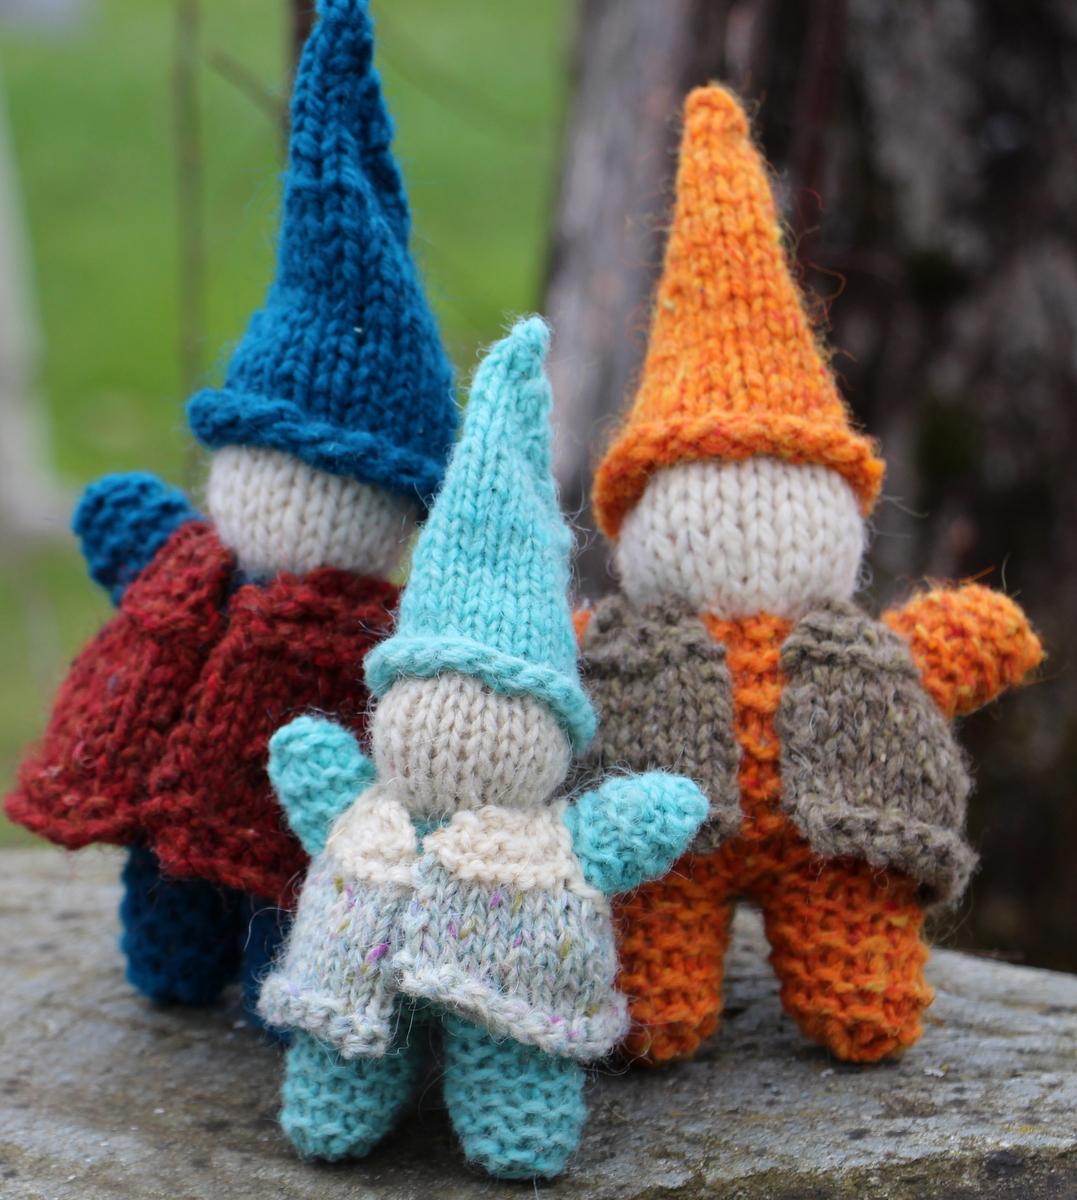 cb6158ff011 Natural Earth Farm  Hand Knit Gnome with Vest